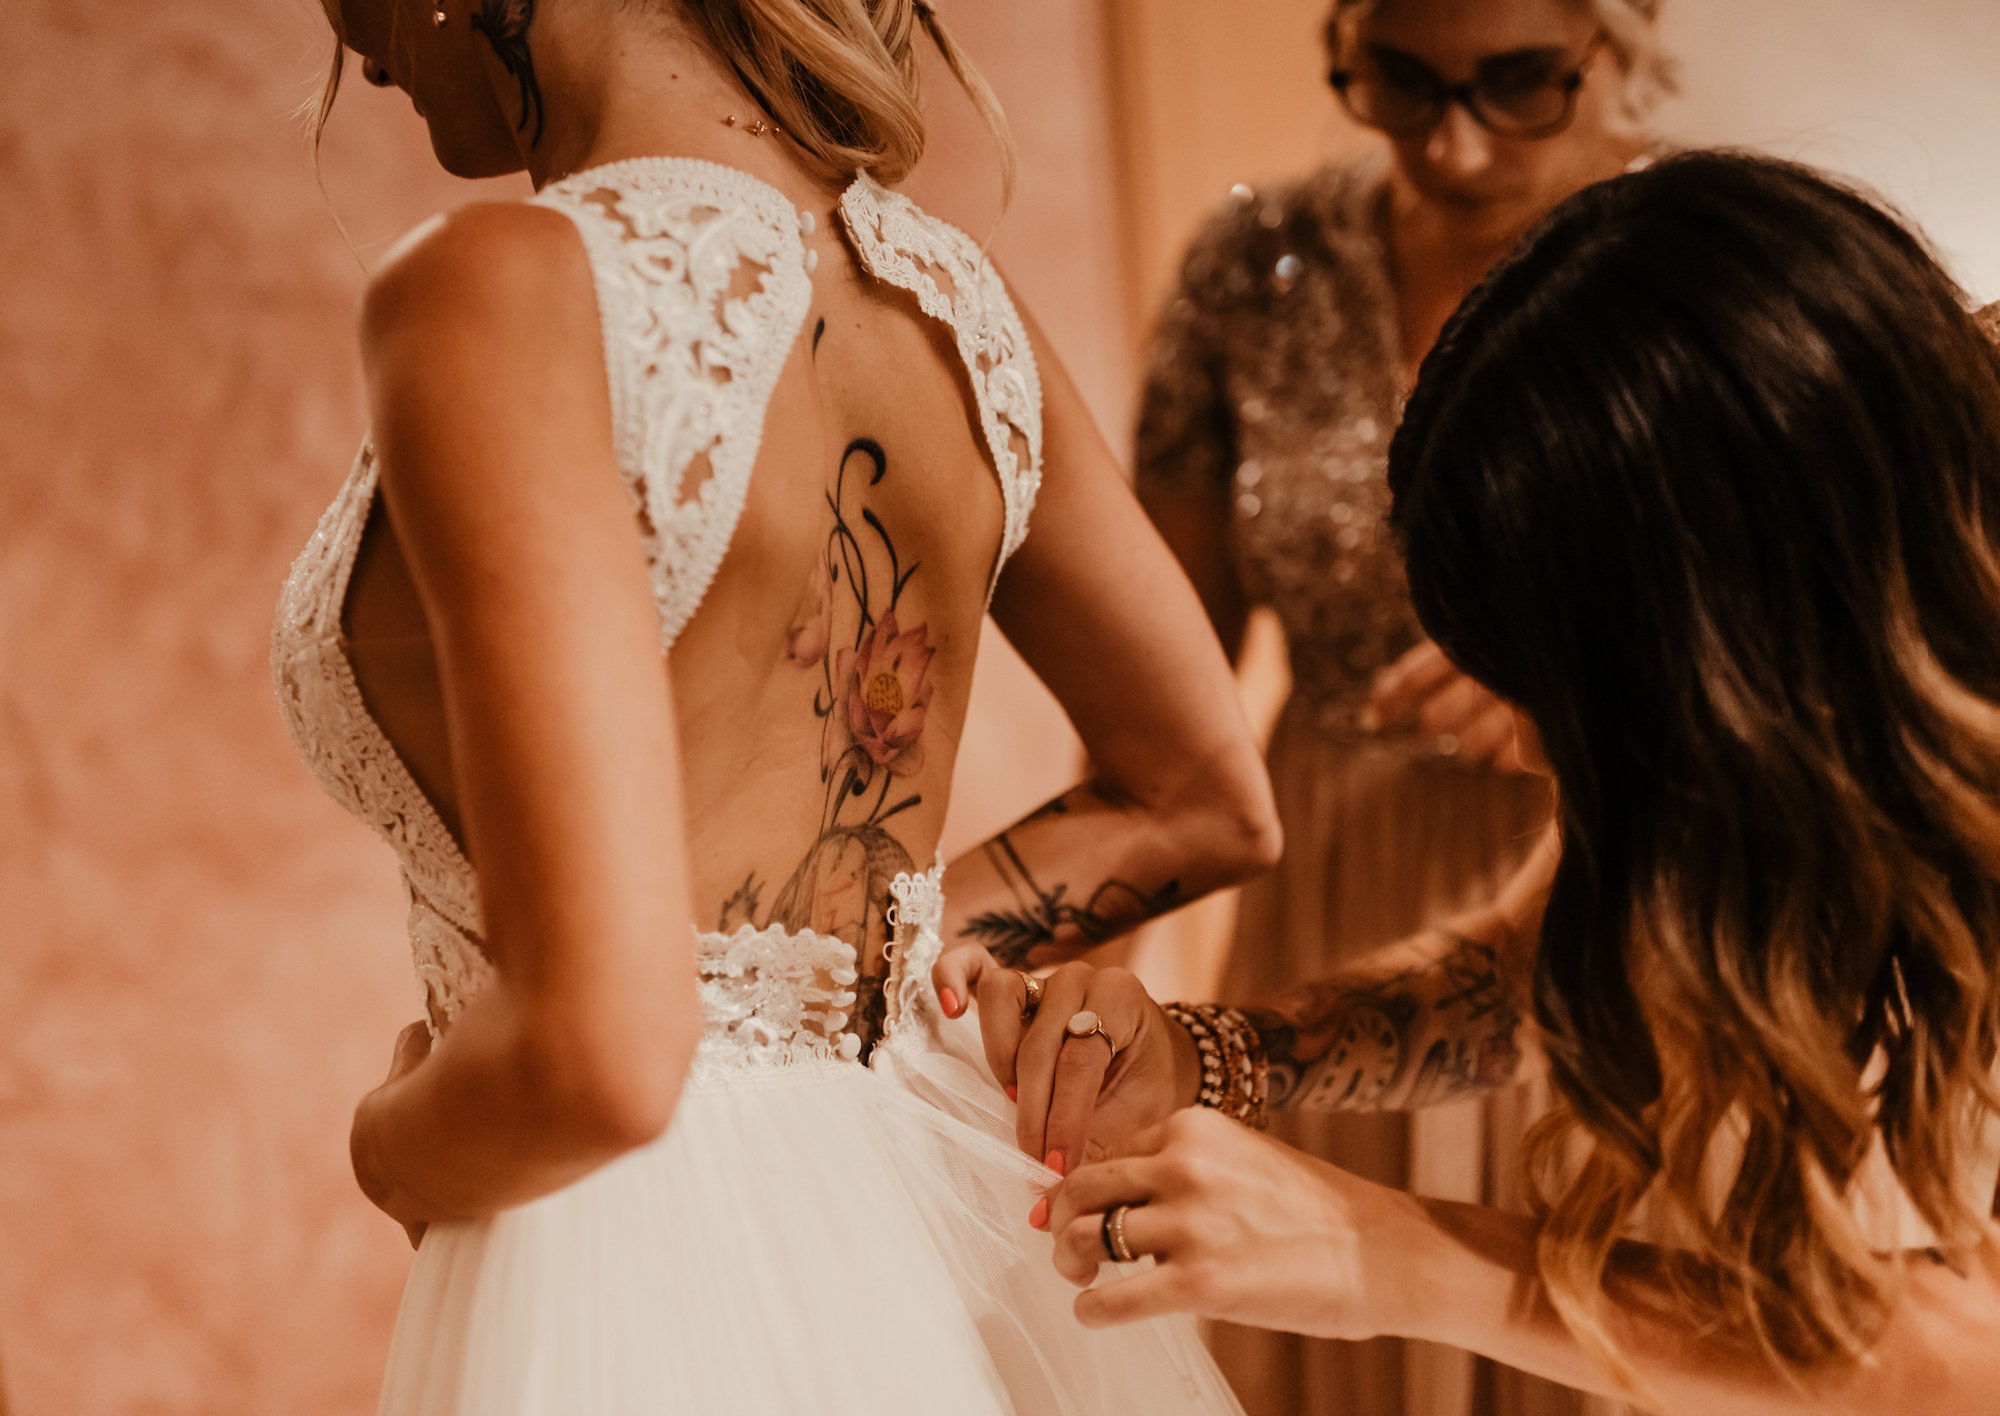 le coeur dans les etoiles - wedding planner - provence - luberon - alpilles - organisation - mariage - wedding - florine jeannot - habillage mariee